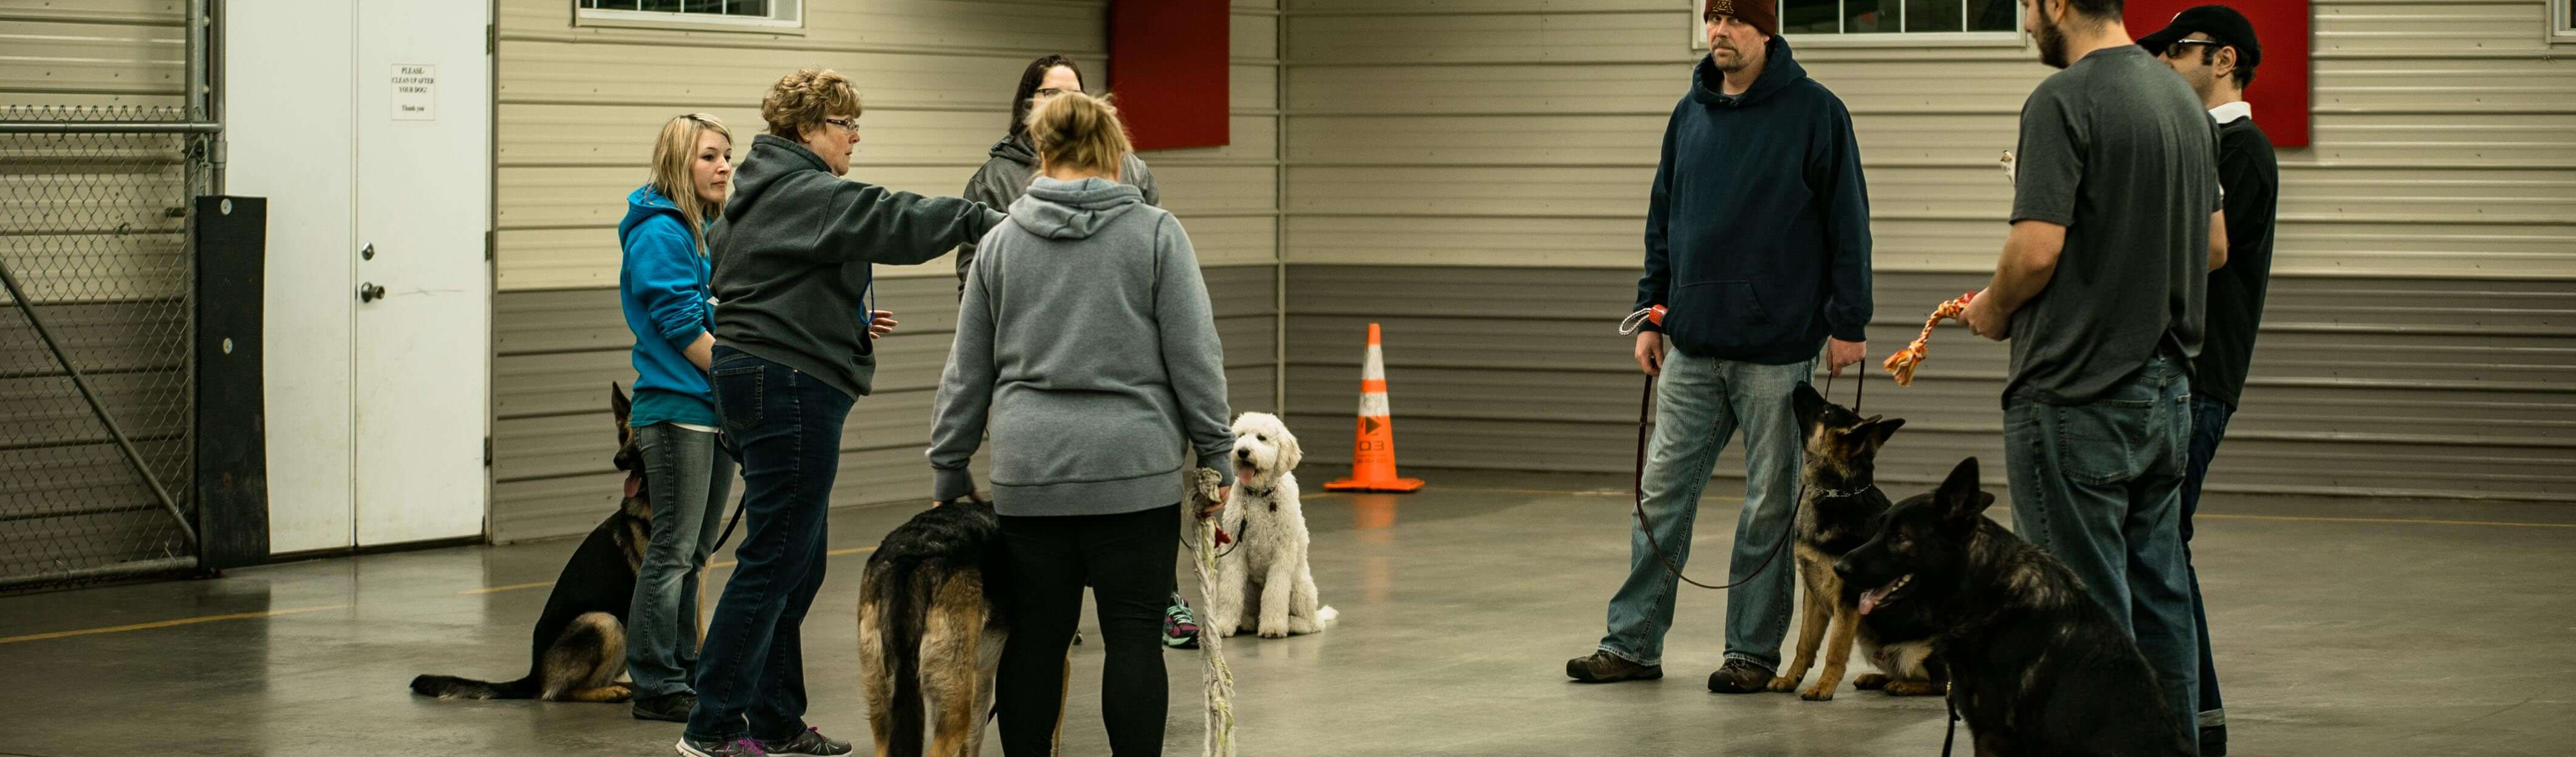 Dog Training | Sam & Danni's – St  Cloud, MN Area